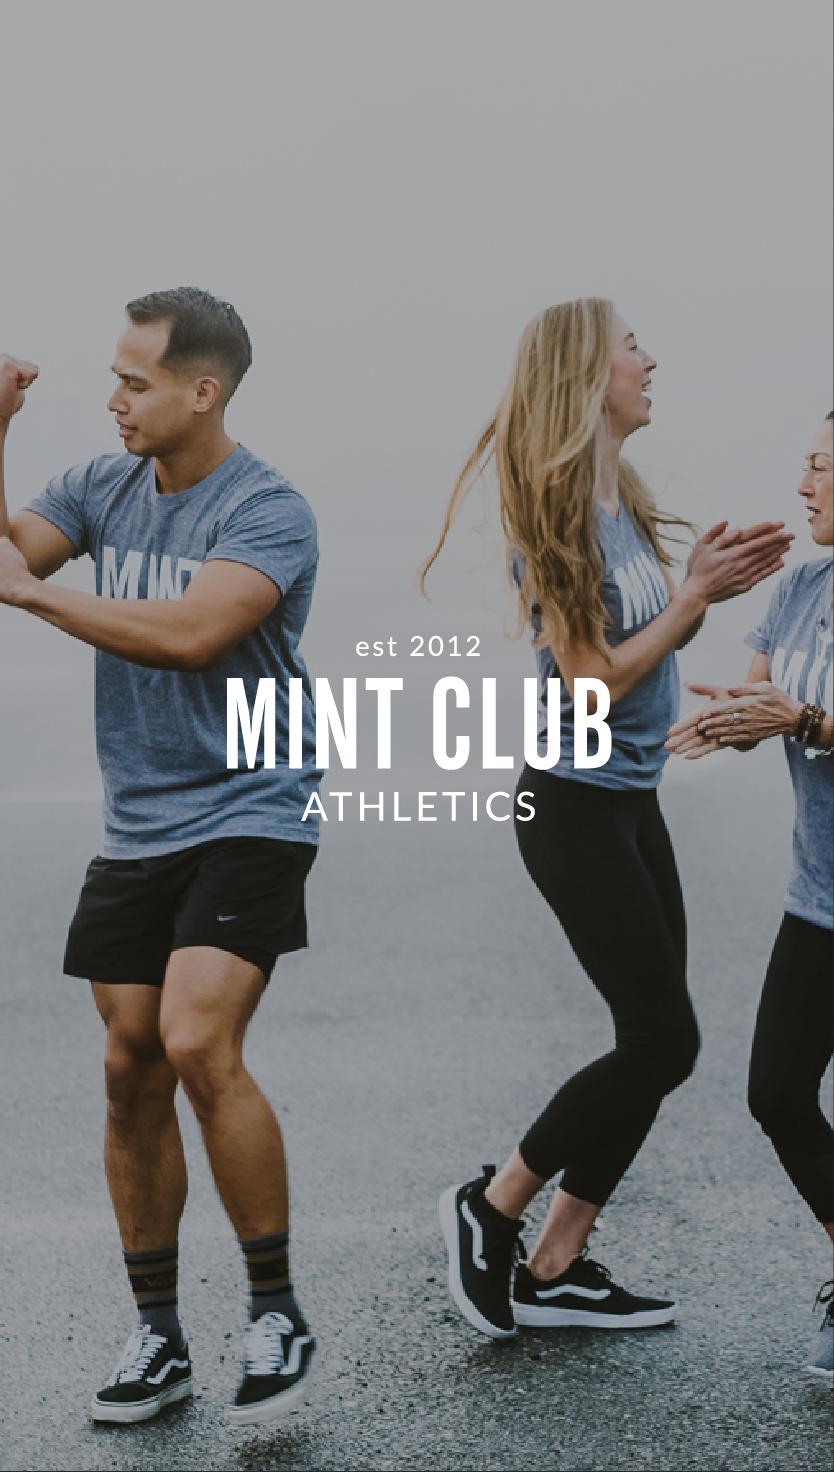 Mint Club Athletics Brand Design Portfolio by Salt Design Co.